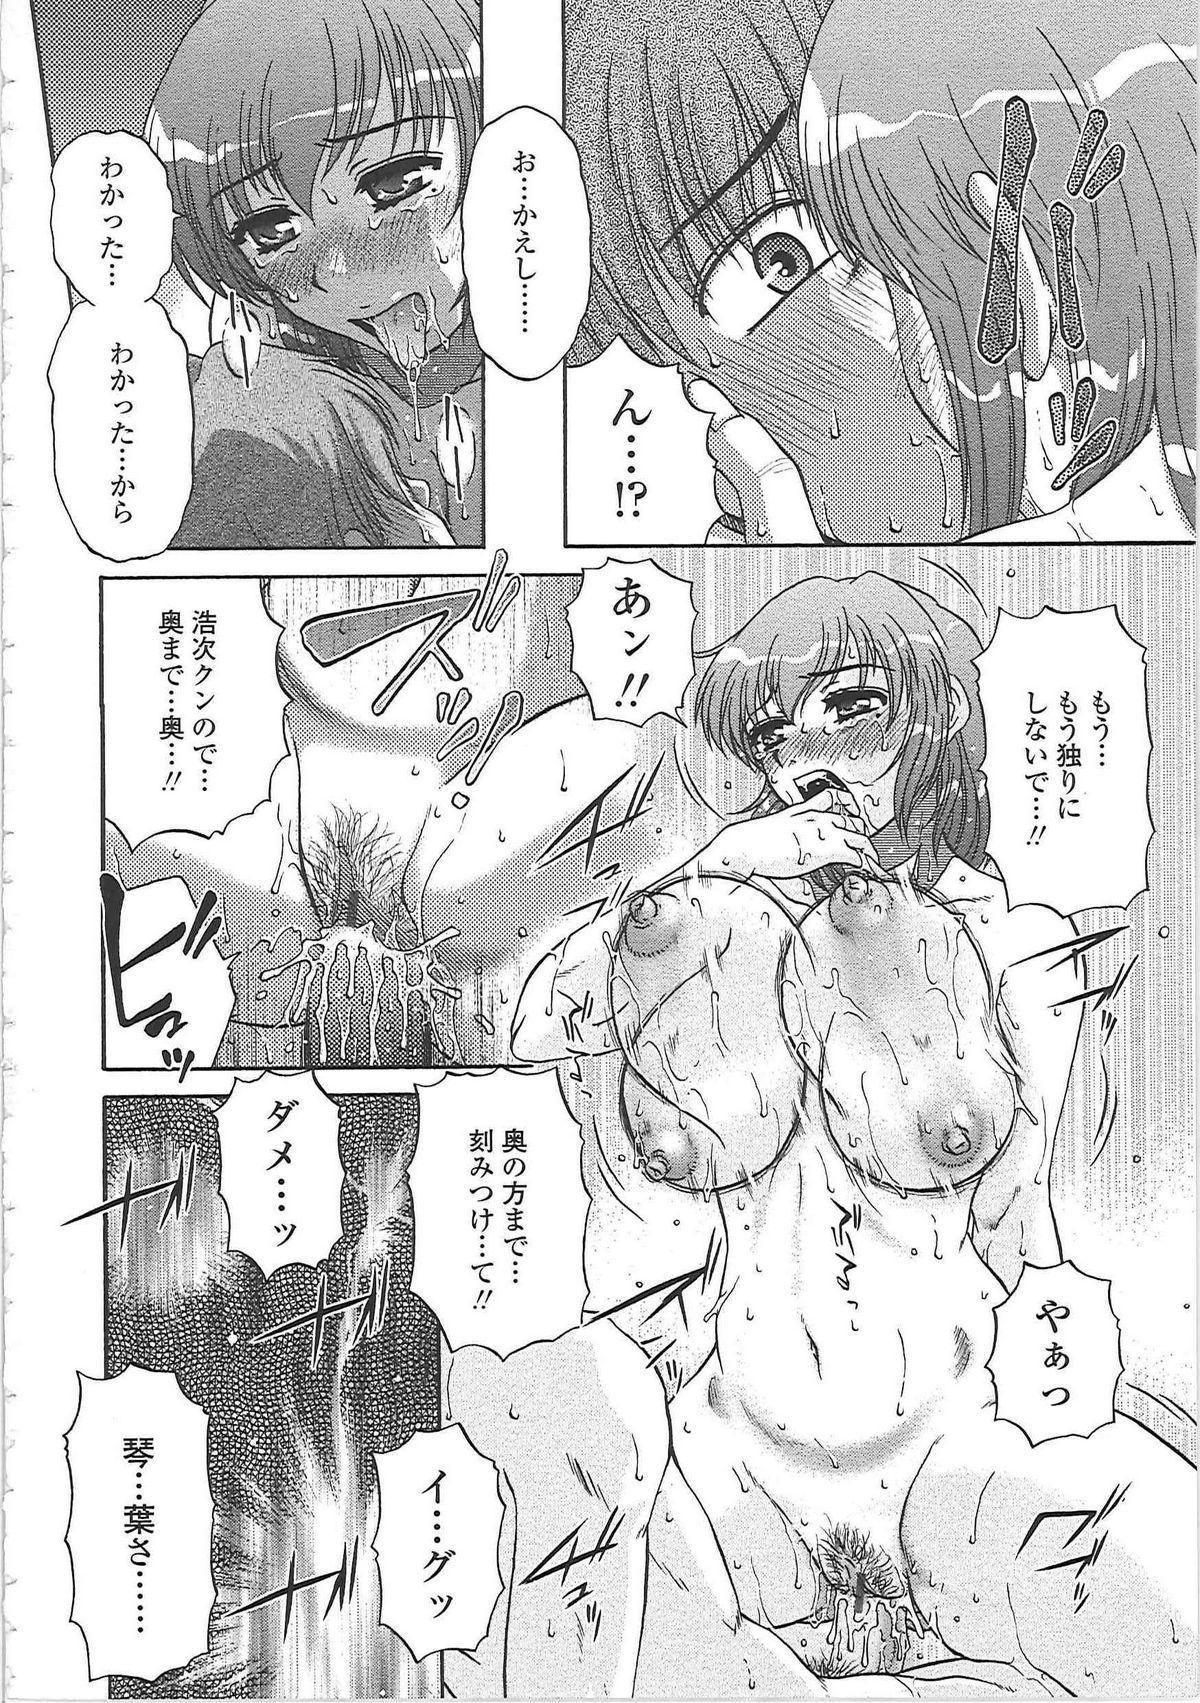 Nikuzuma Tsuushin - Erotic Wife Communication 60